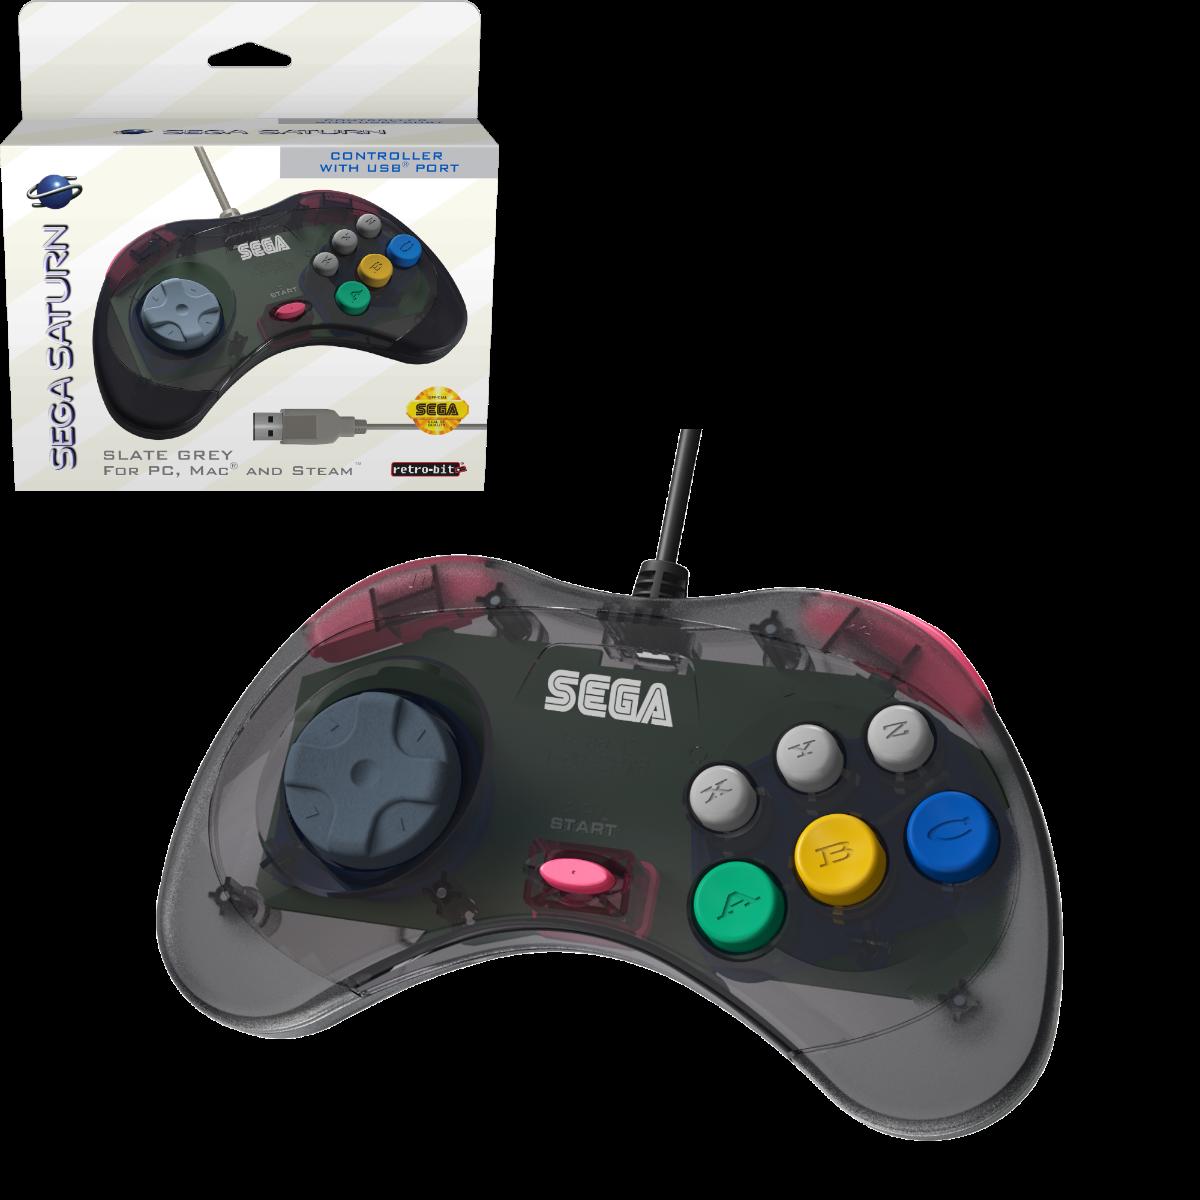 Retro-Bit Officially Licensed SEGA Controllers